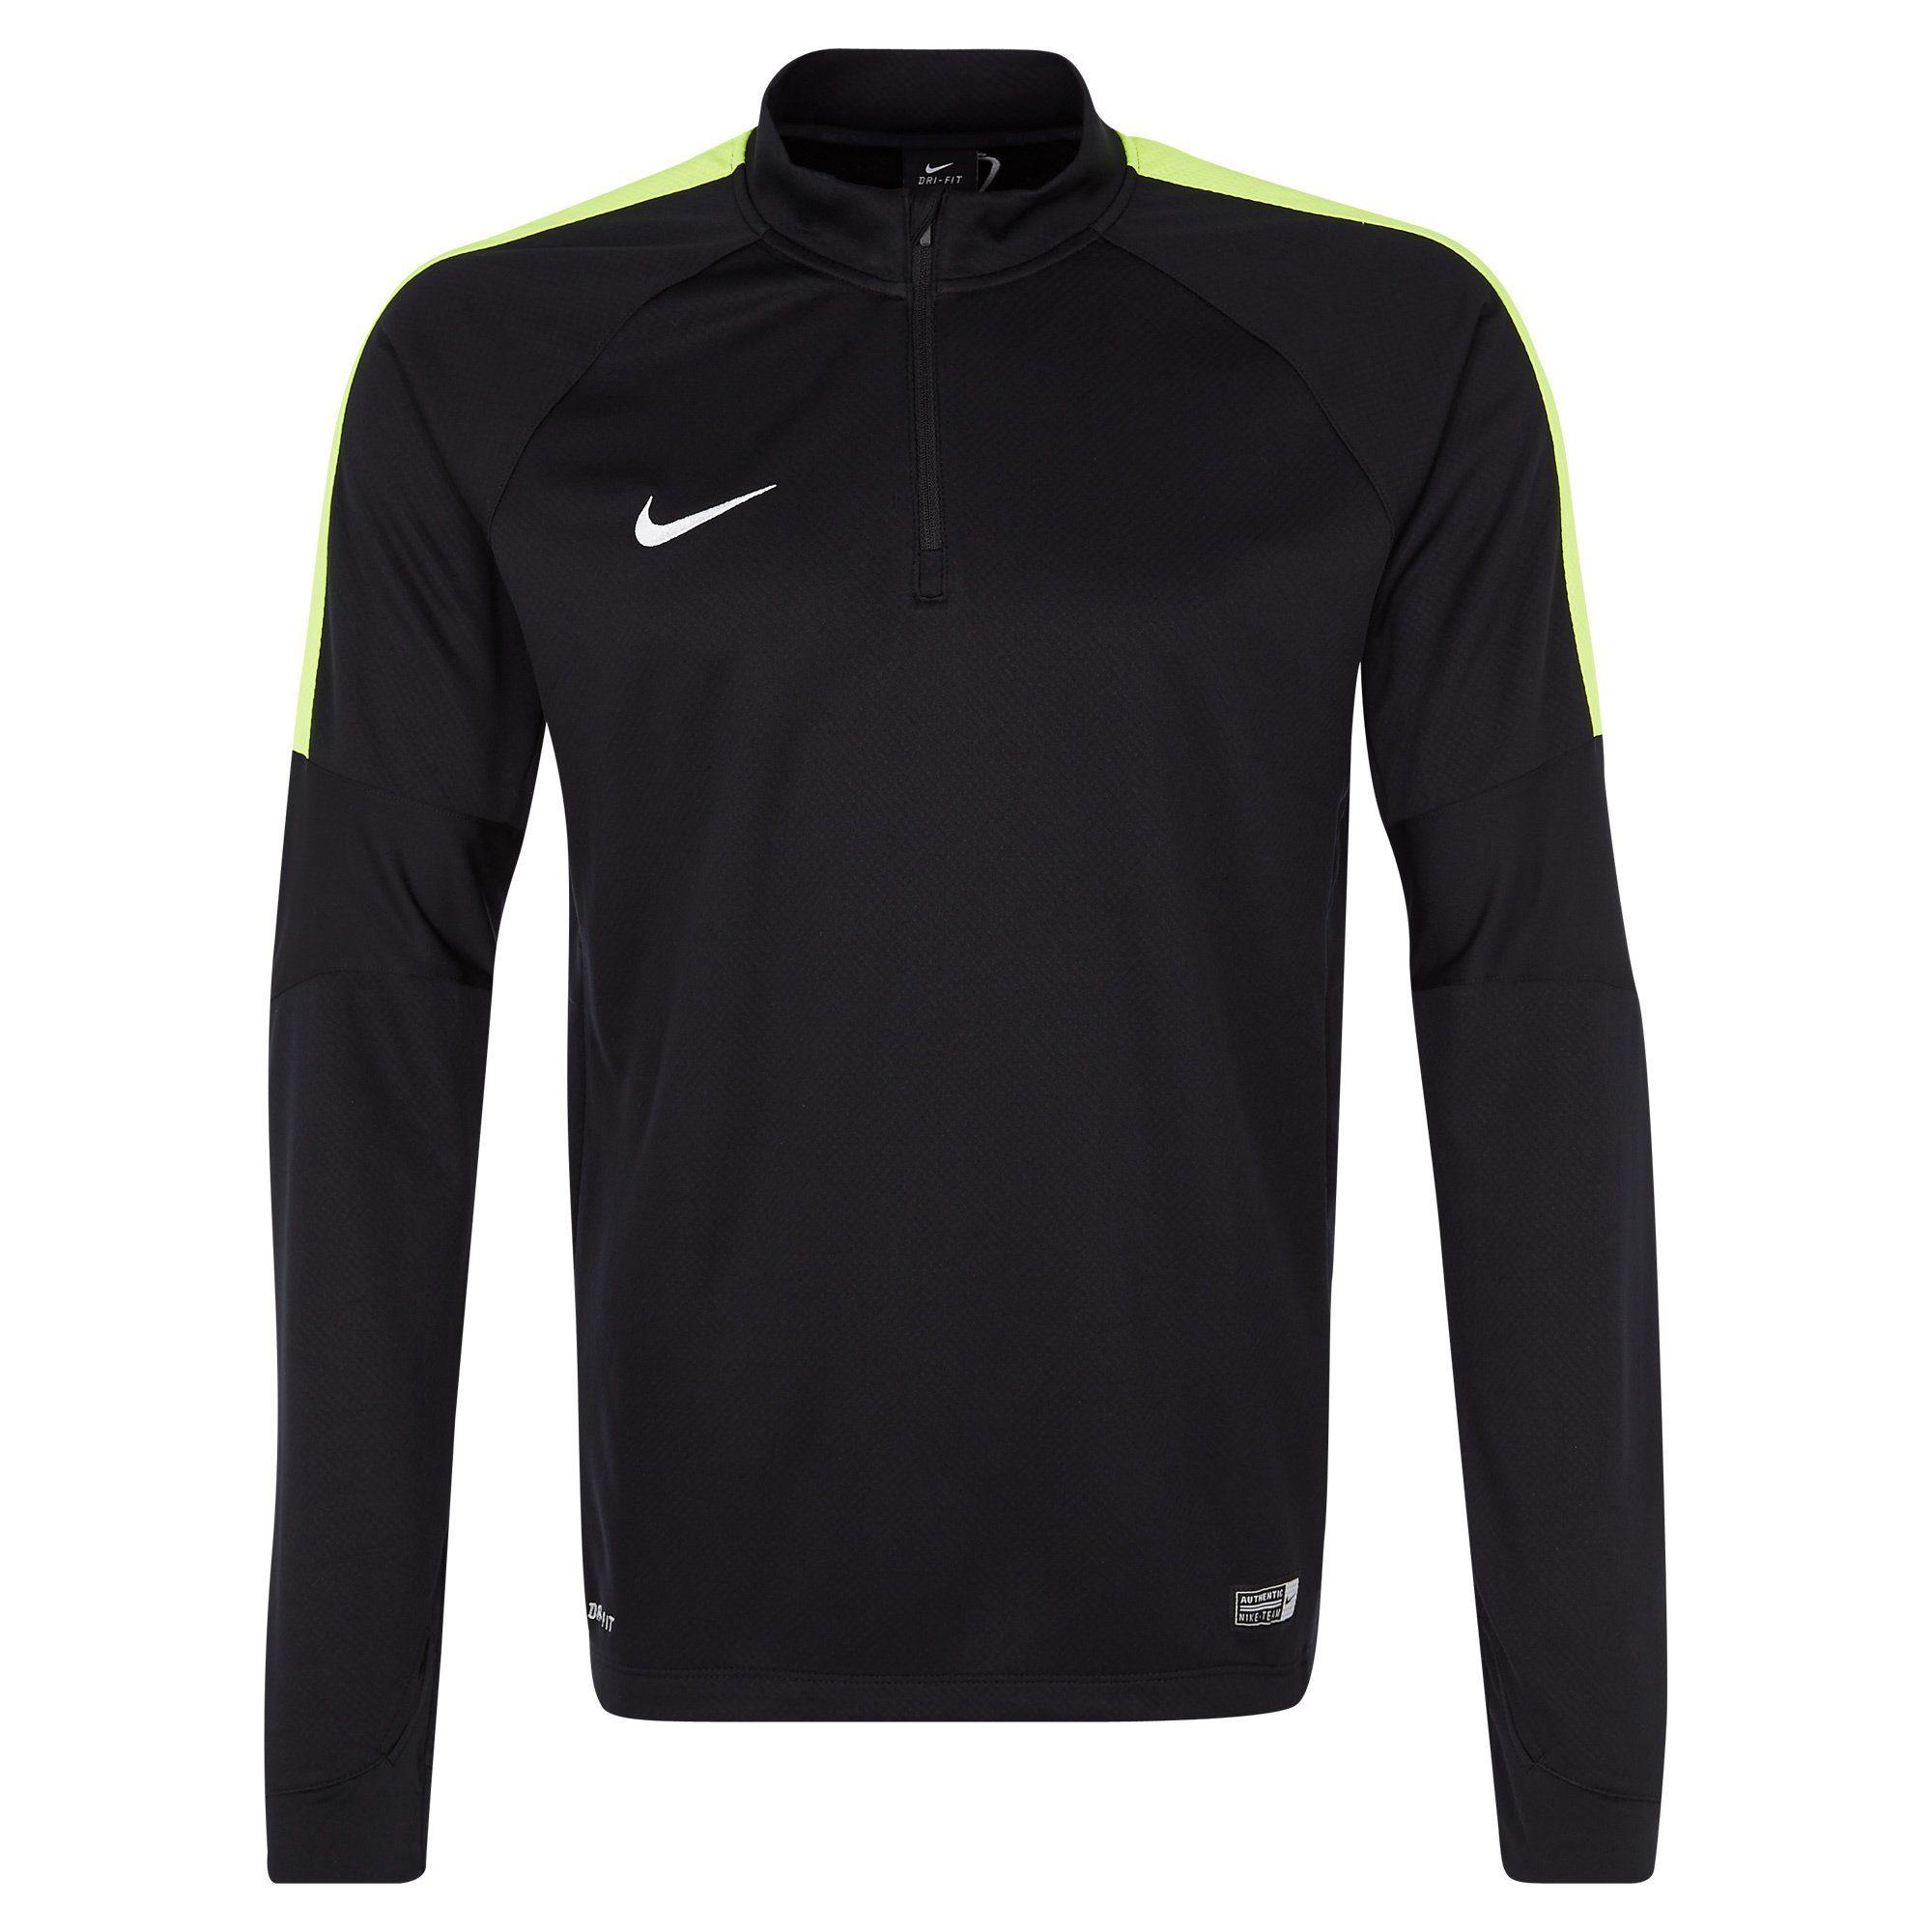 Nike Sweatshirt  Nike Squad 15 Ignite Midlayer Sweatshirt Herren  Preisvergleich